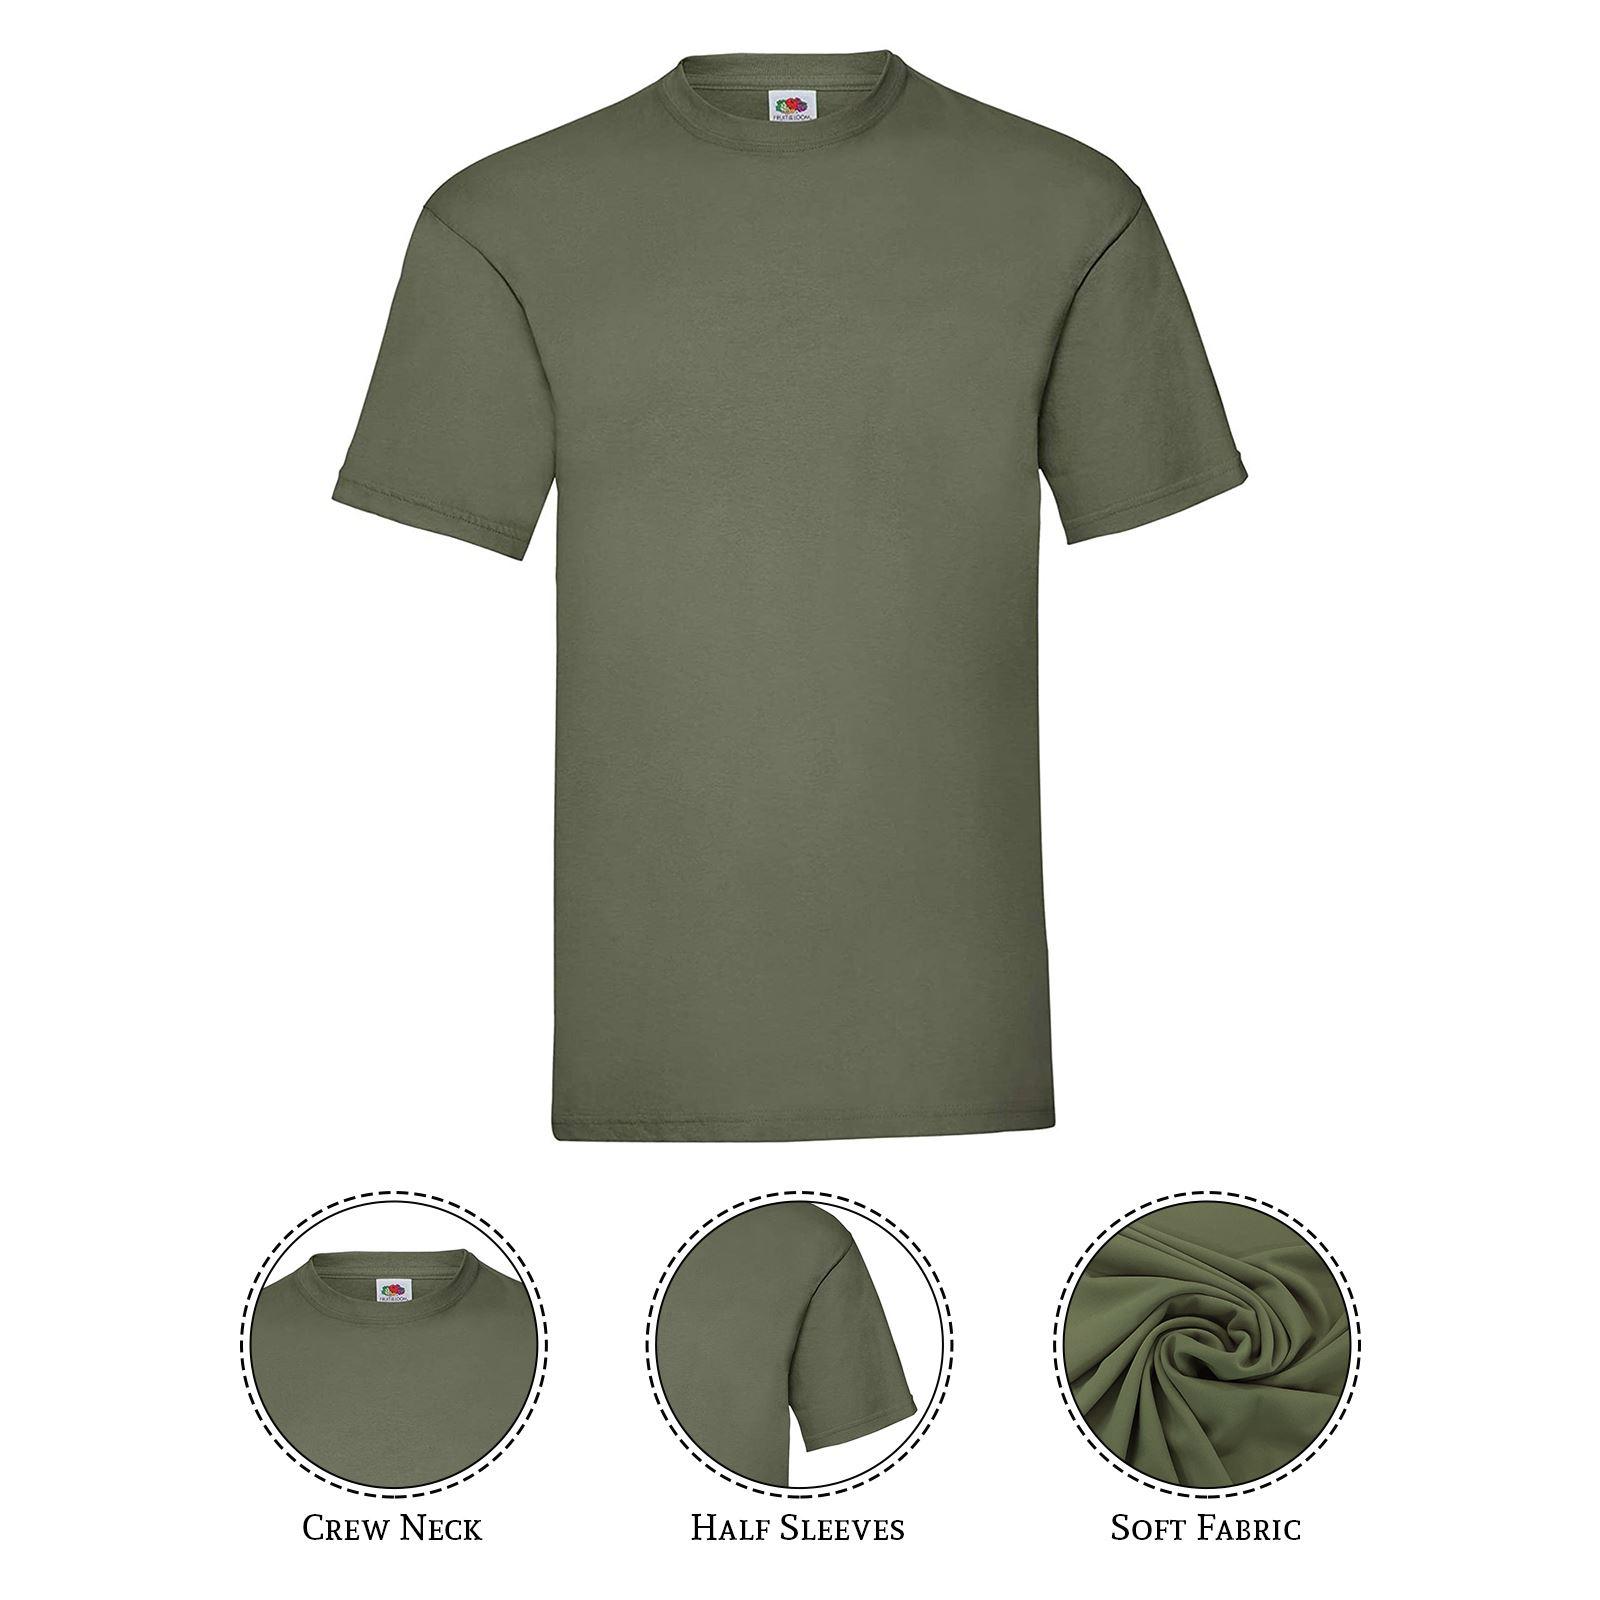 thumbnail 15 - Men-s-Fruit-Of-The-Loom-T-Shirt-Original-100-Cotton-Casual-Plain-Top-Tee